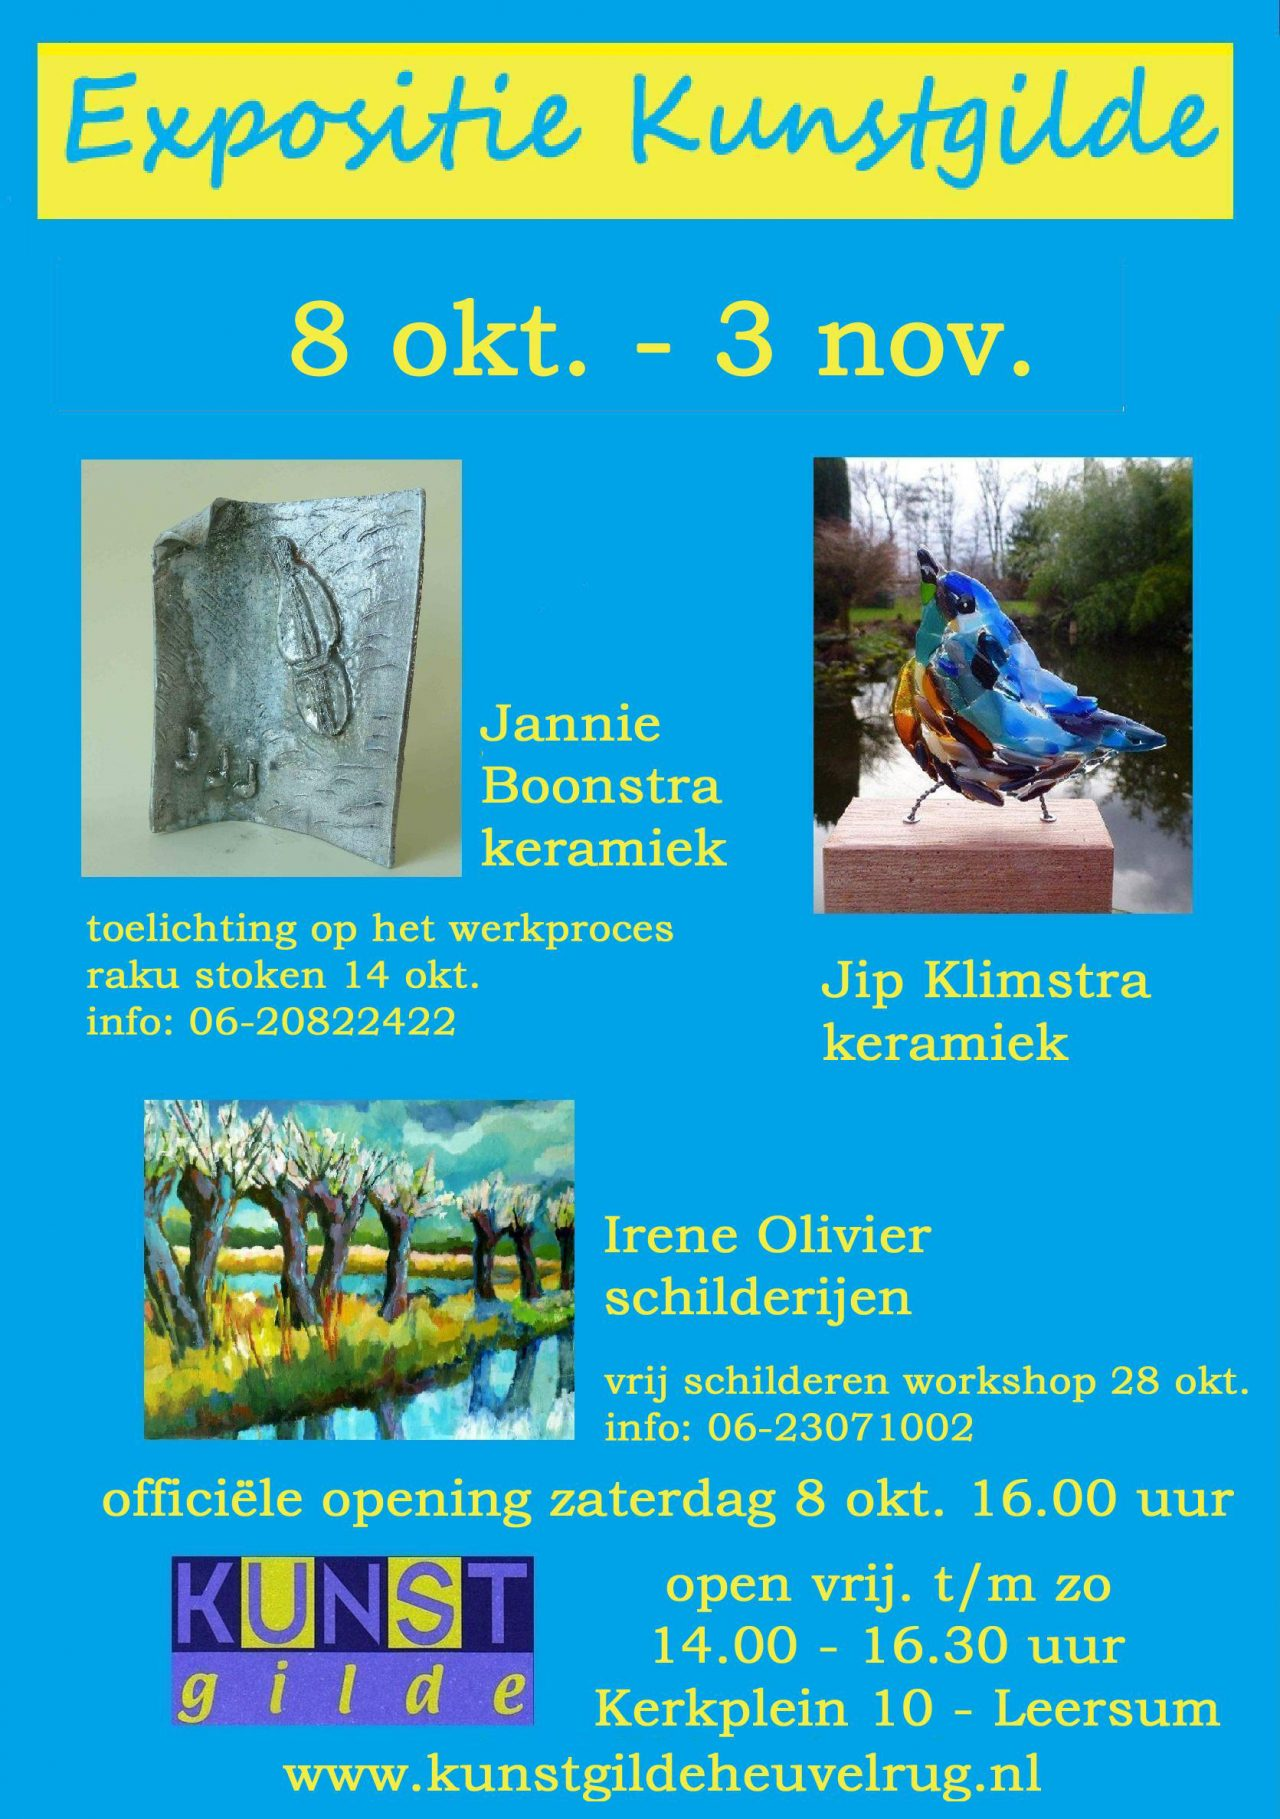 https://www.kunstgildeheuvelrug.nl/wp-content/uploads/2016/09/poster-8-okt-website.jpg